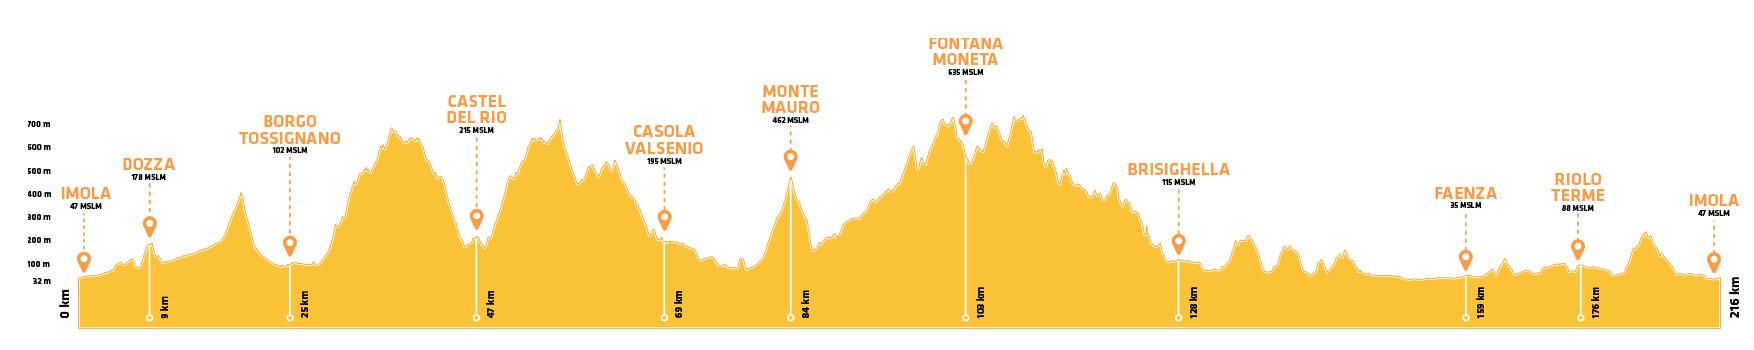 Altimetria Ciclobrevetto Romagna 4 Bike Mountain Bike Trail